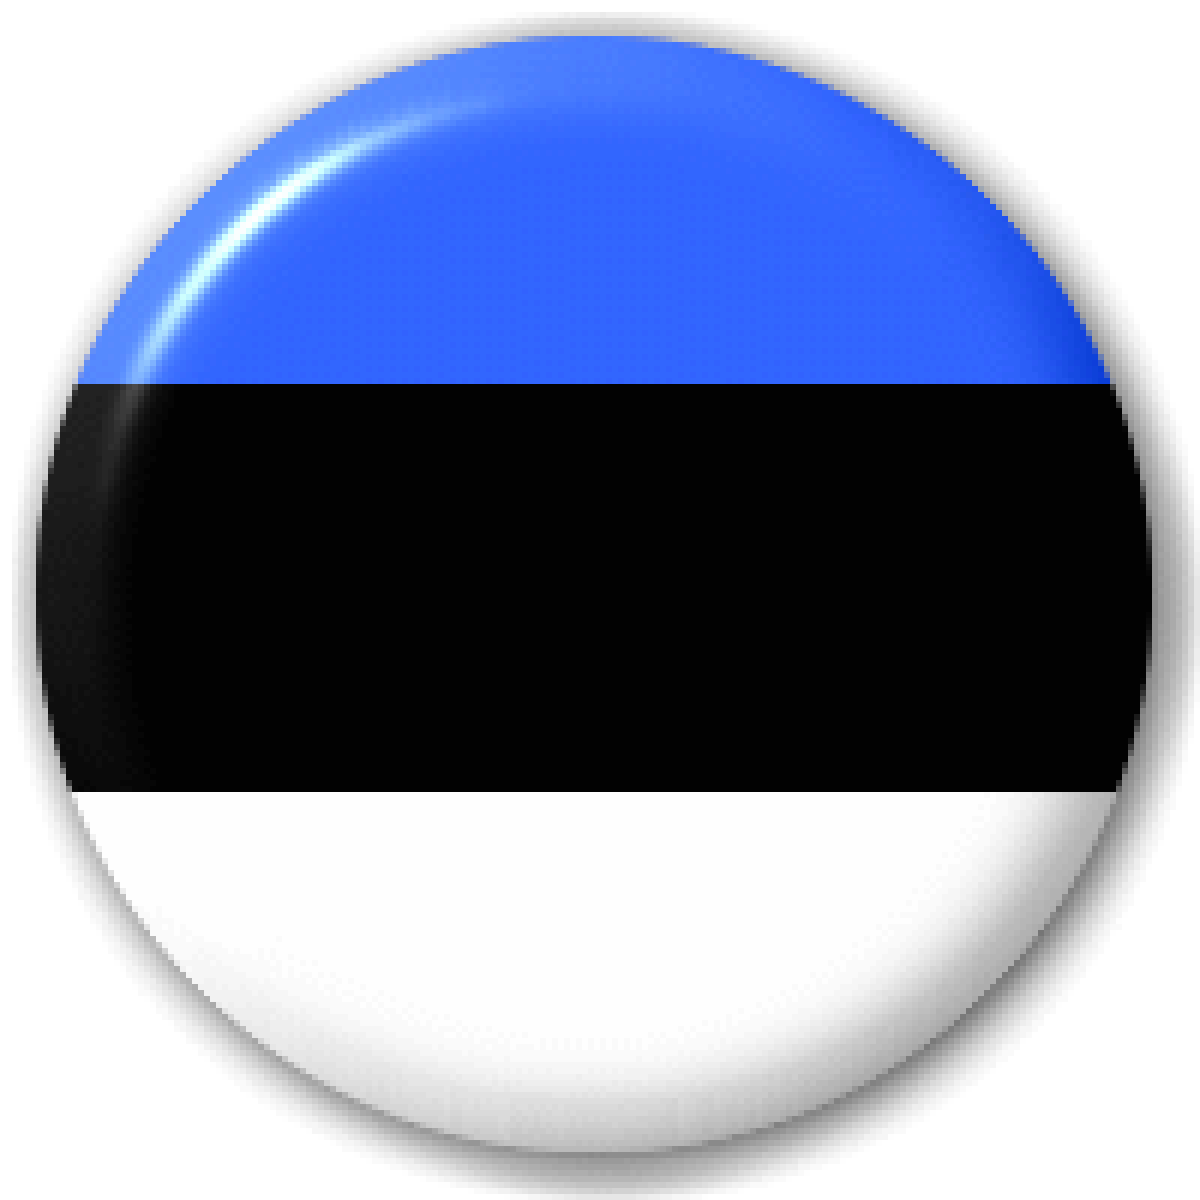 HQ Flag Of Estonia Wallpapers | File 22.41Kb